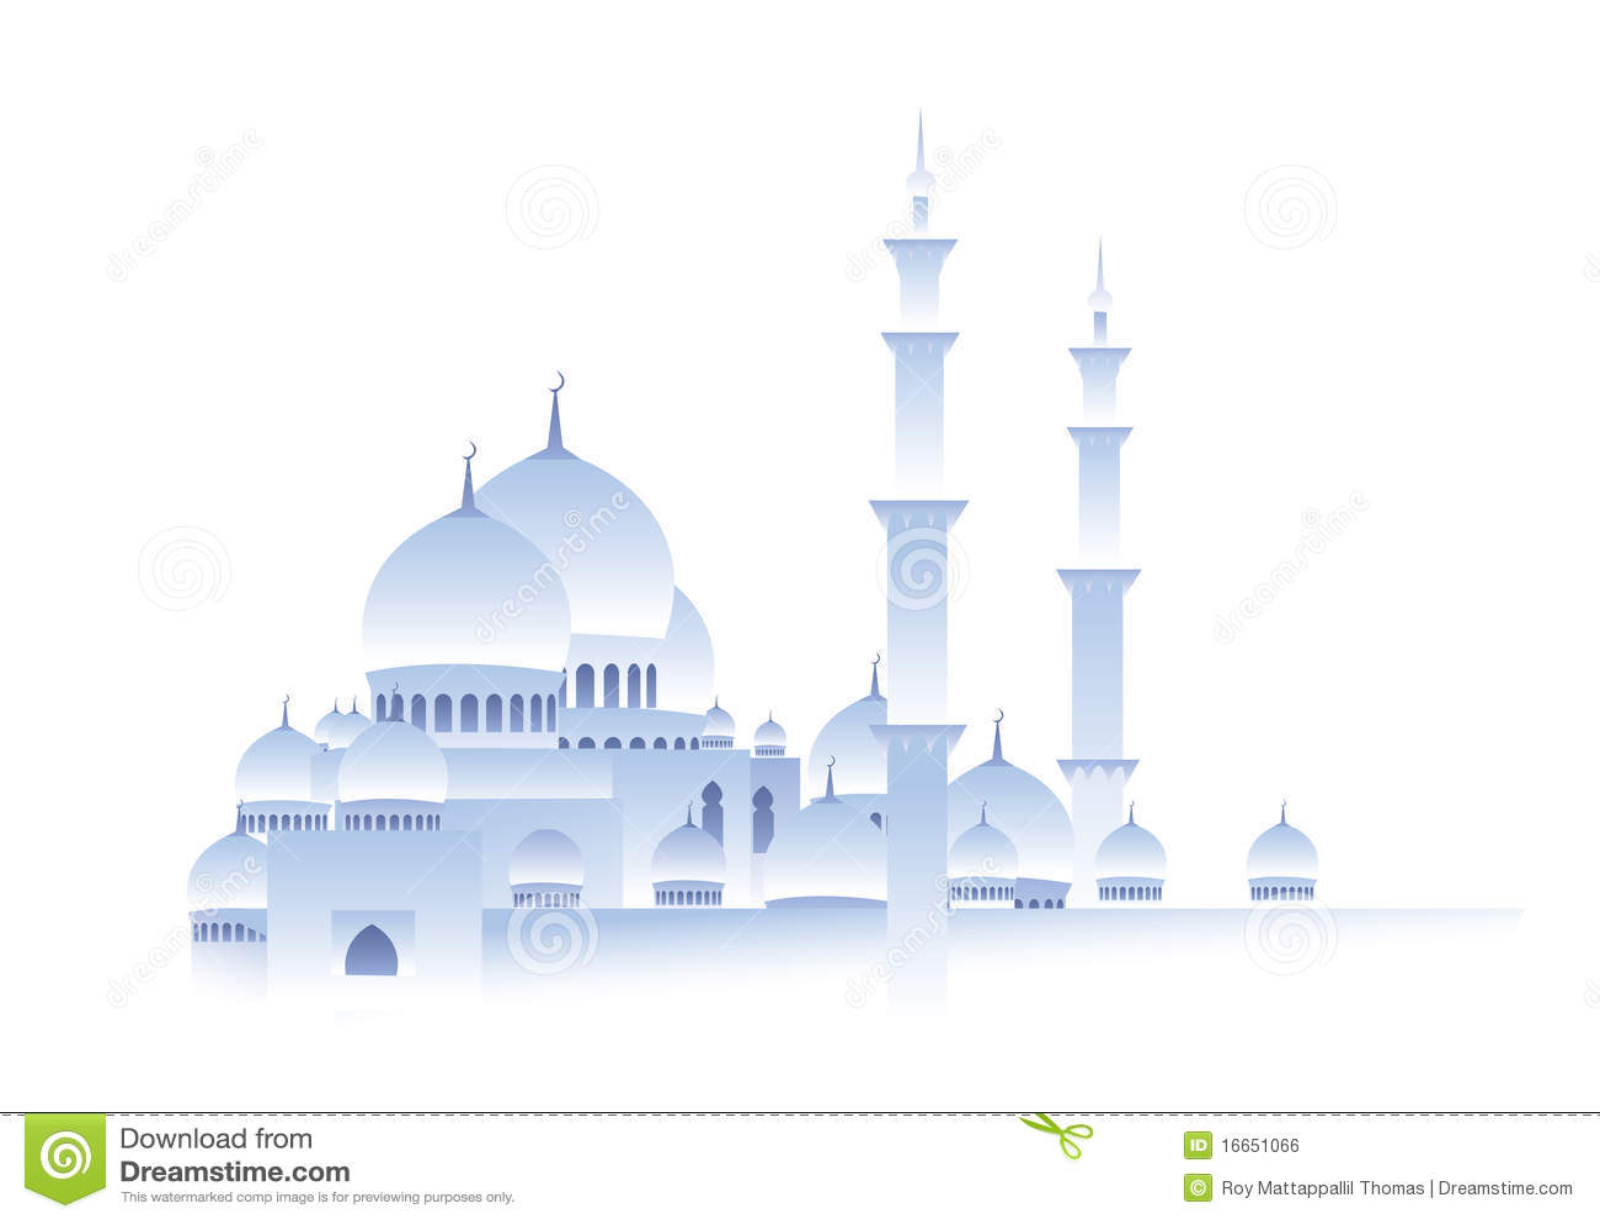 100 Foto Gambar Masjid Latar Putih Paling Keren